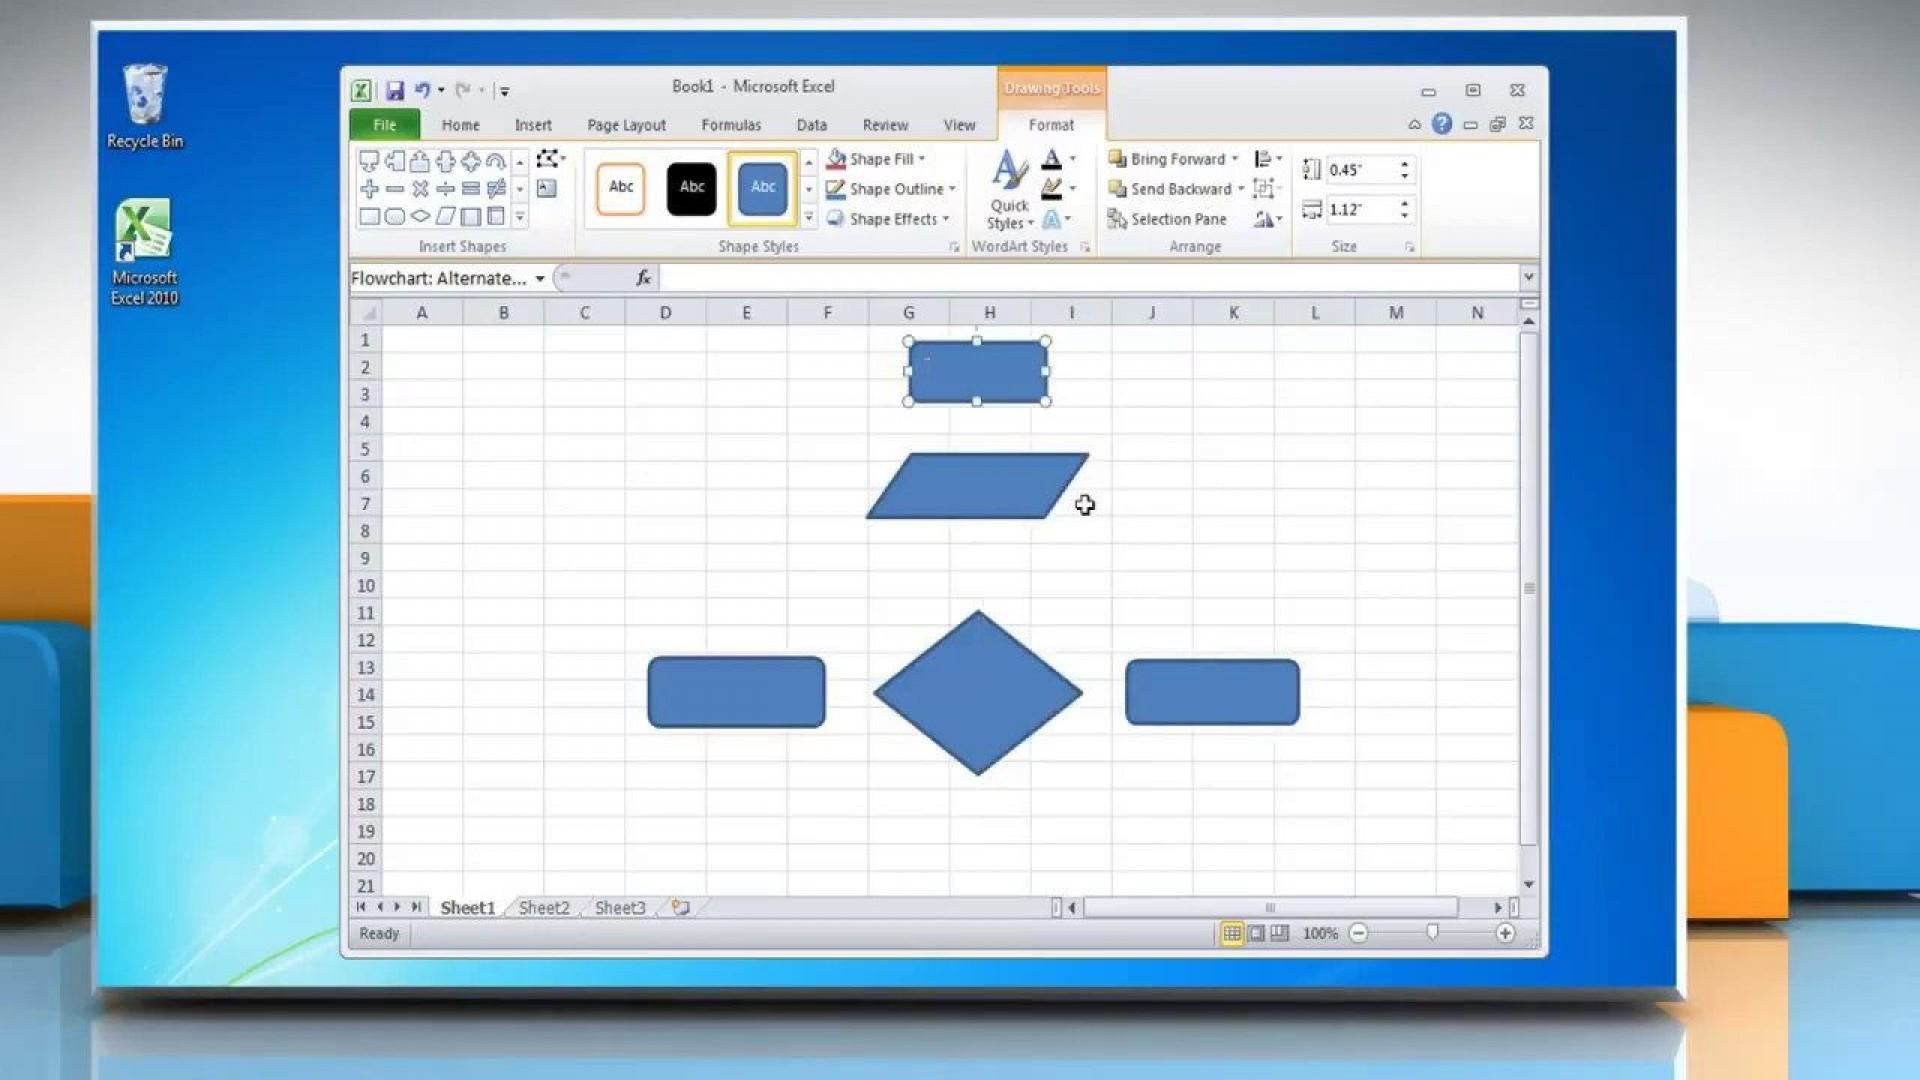 003 Unusual Flow Chart Microsoft Excel High Def  Flowchart Template1920